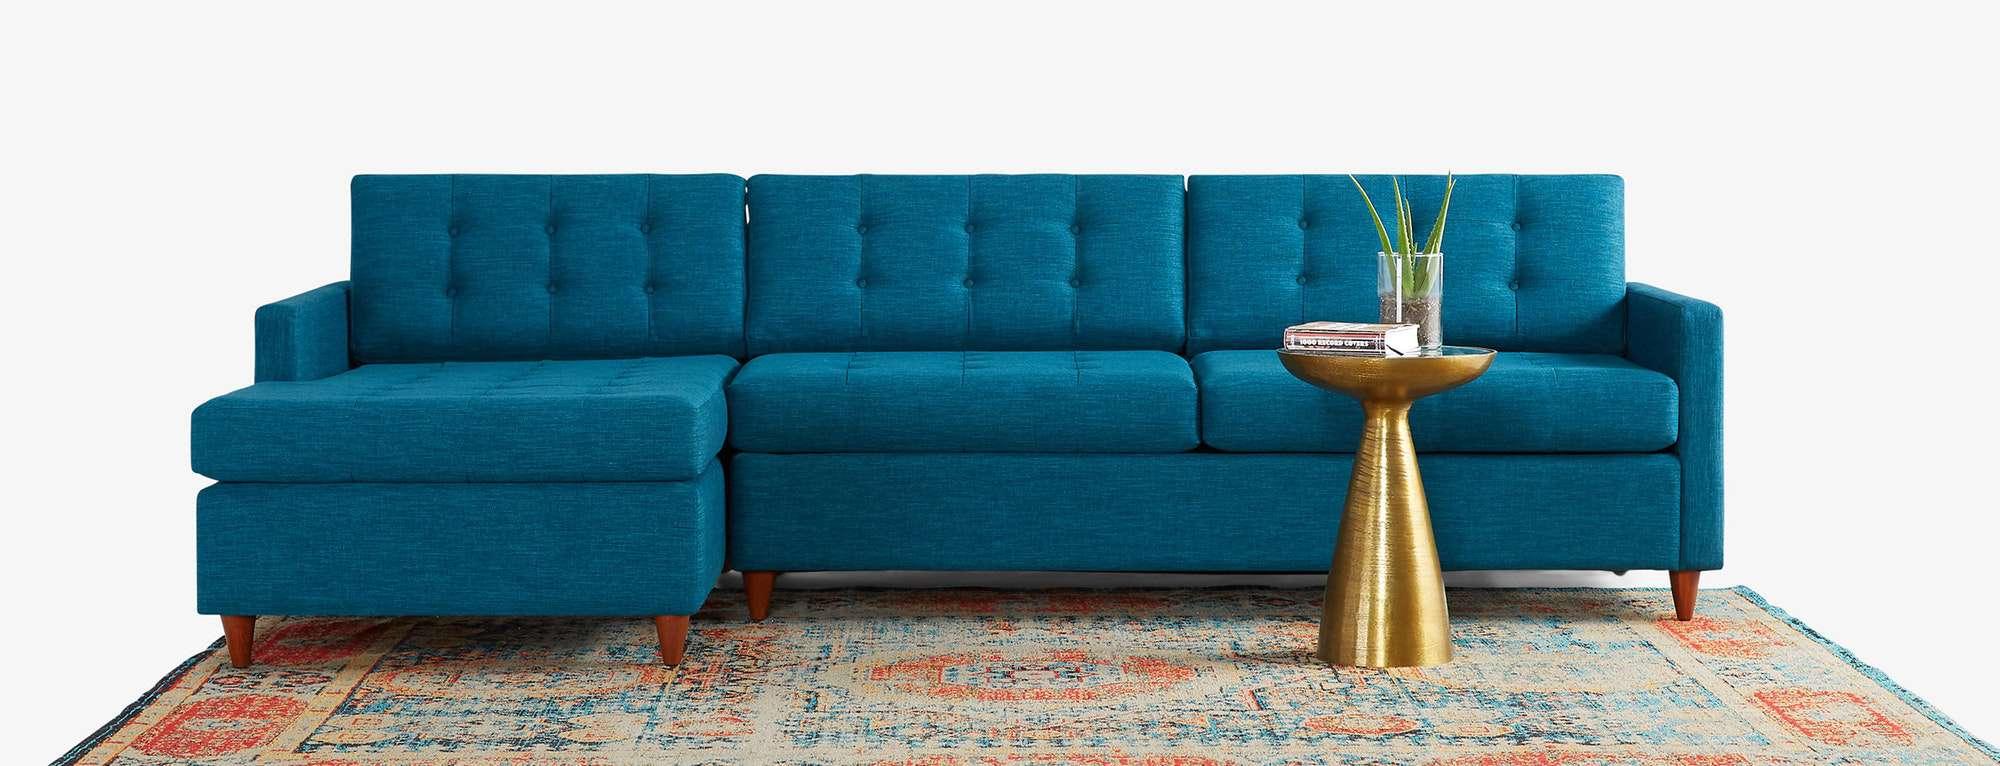 The 8 Best Sleeper Sofas Of 2021